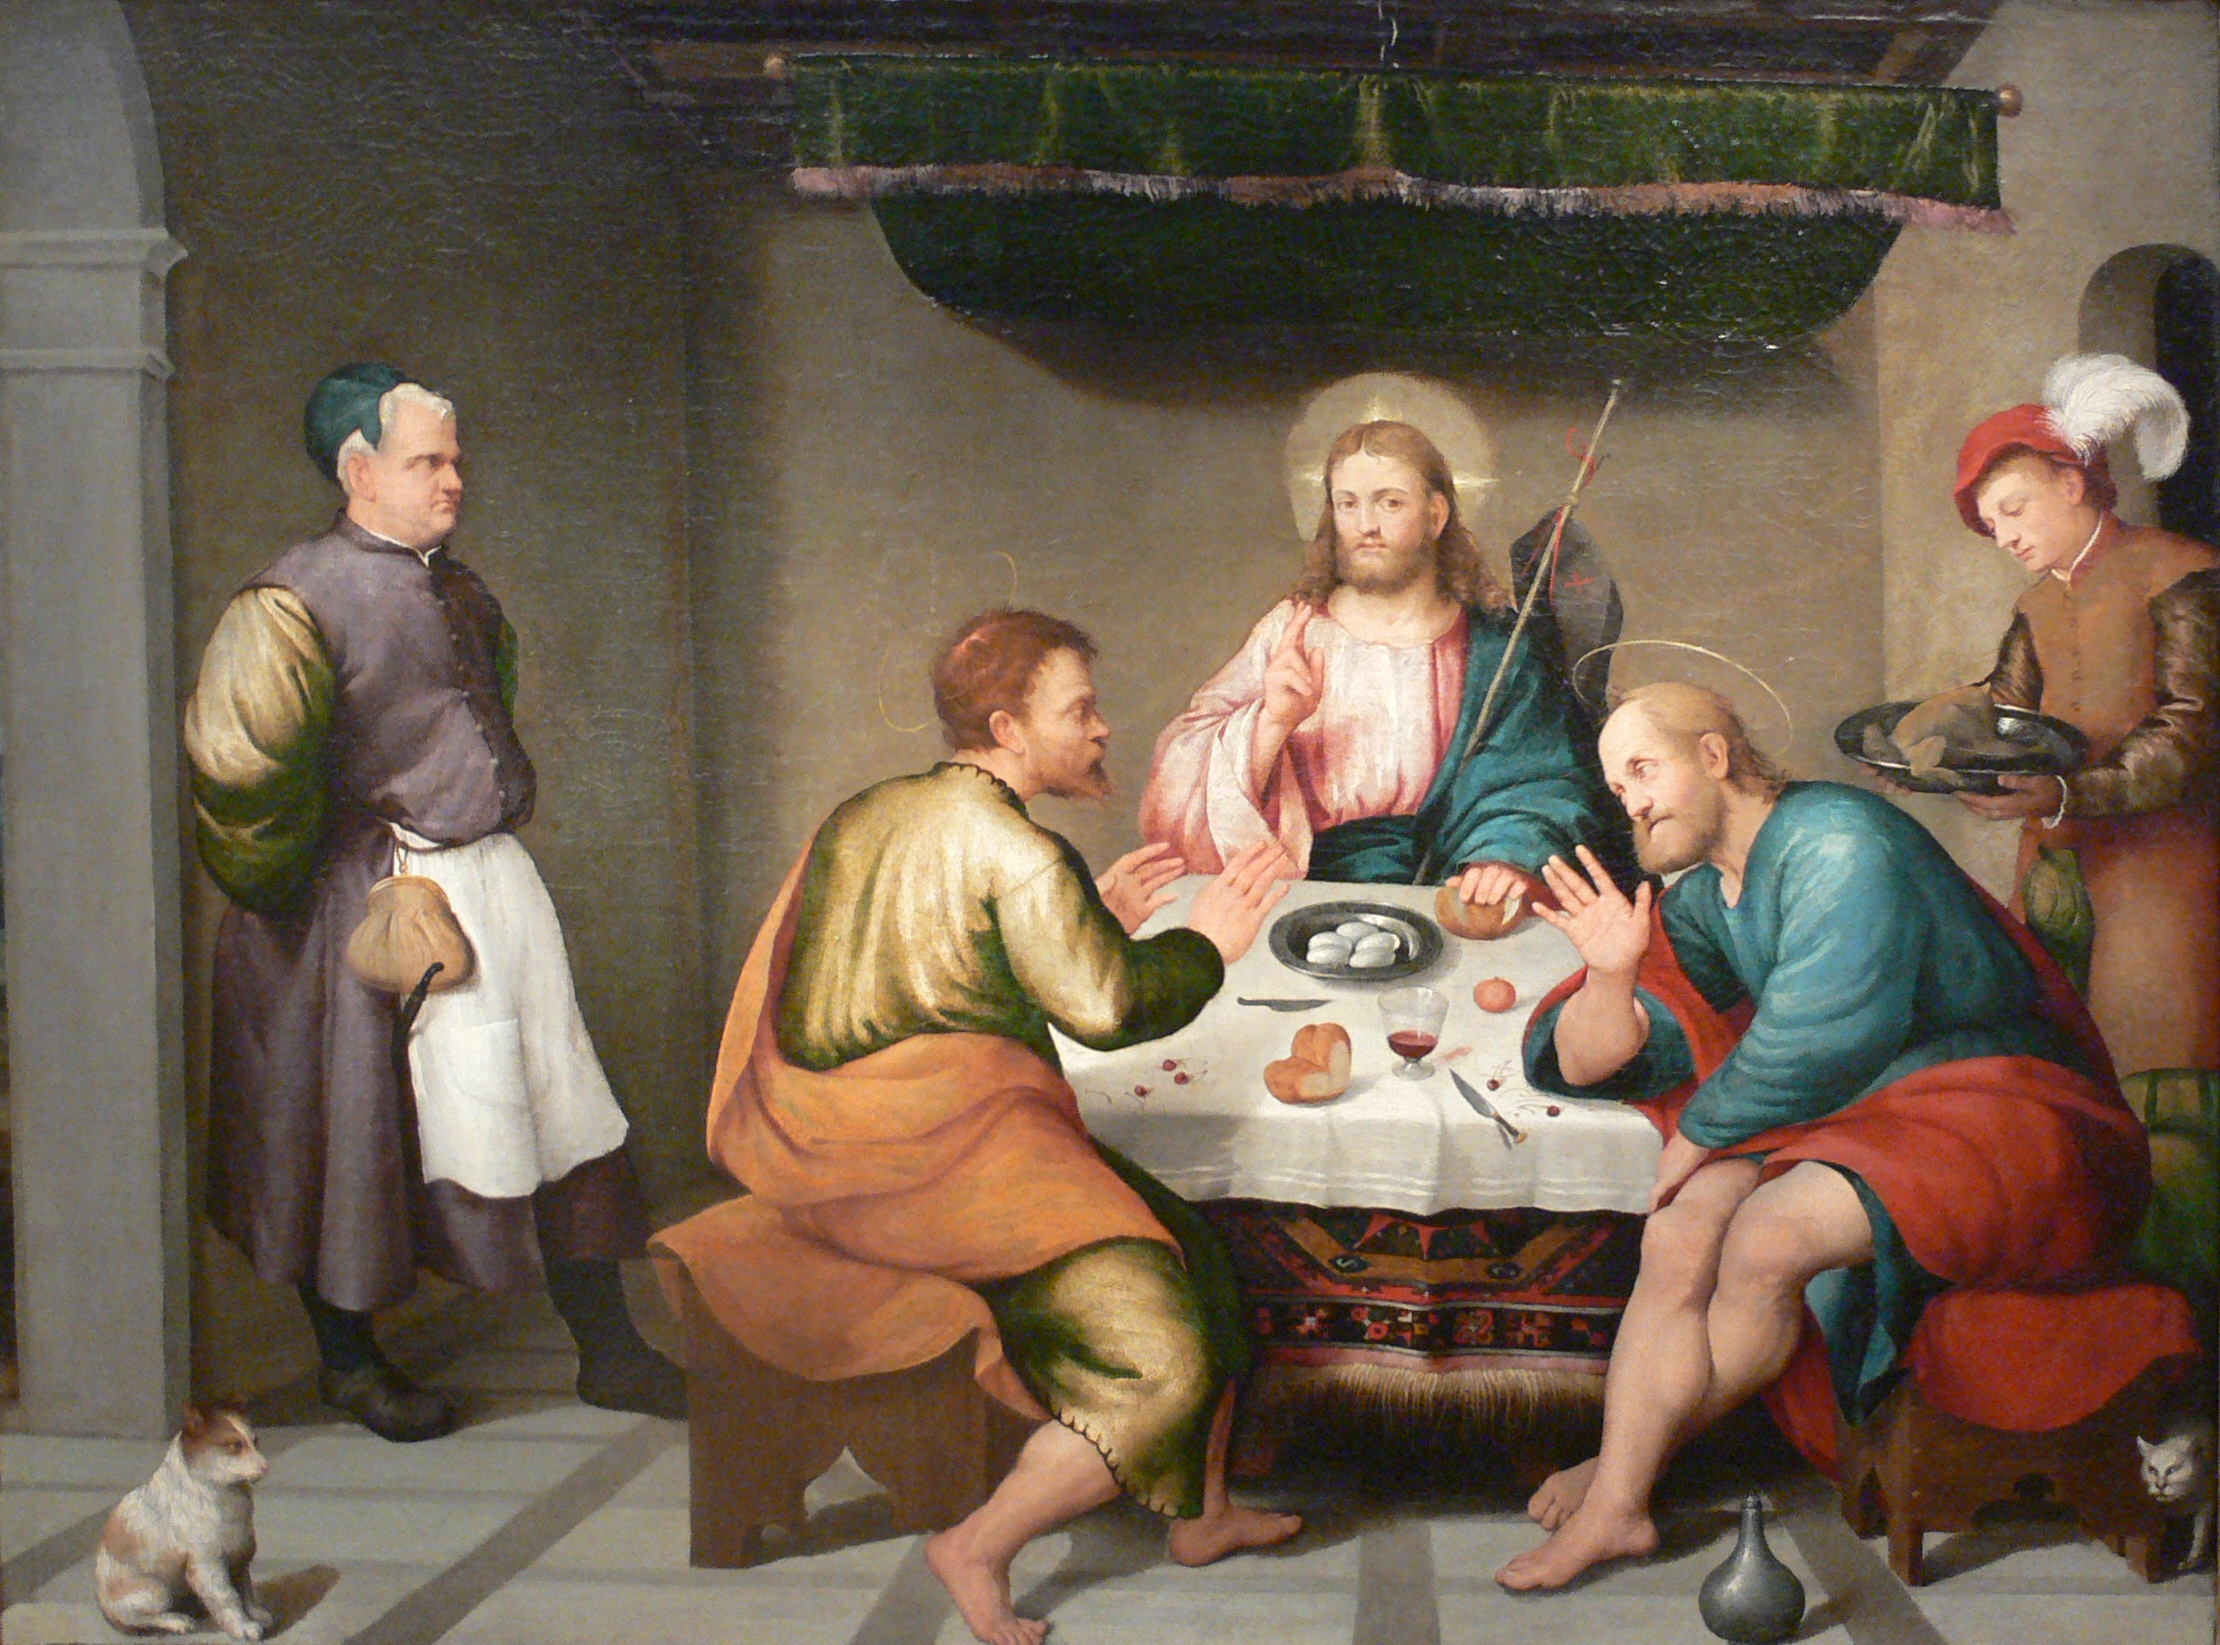 Jacopo_da_Ponte_Bassano_Supper_at_Emmaus_Kimbelljpg